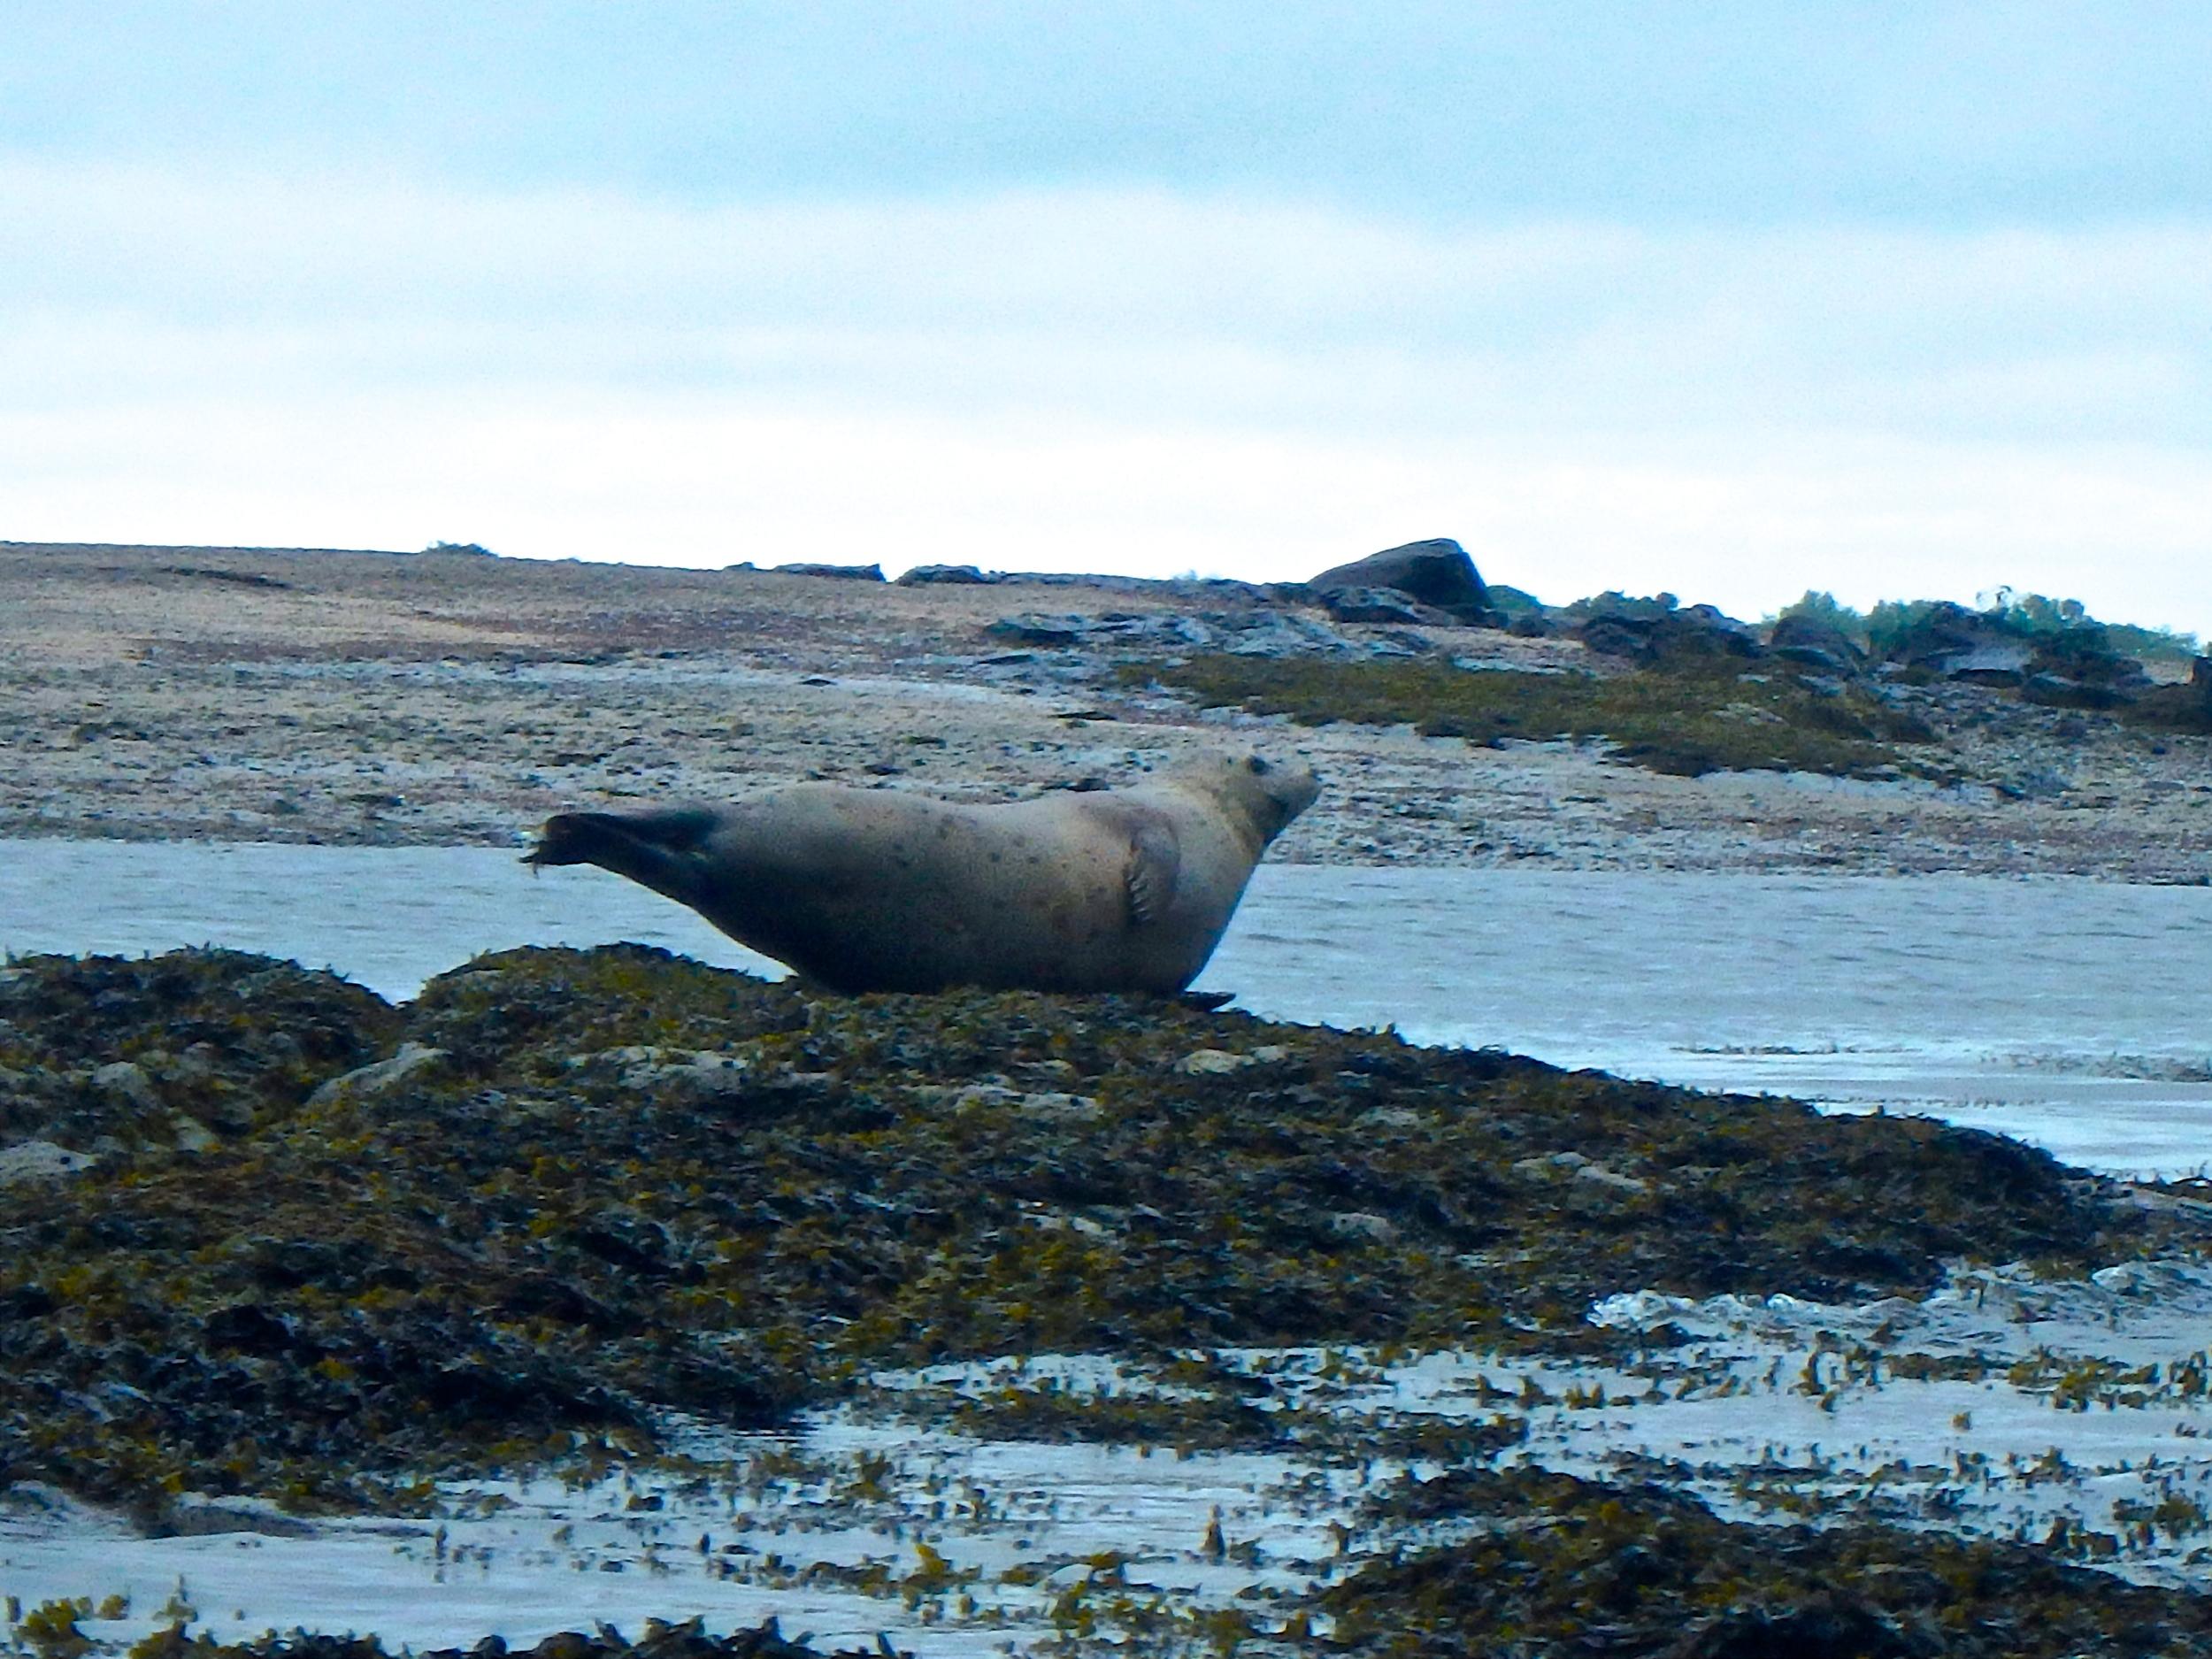 A harbor seal hauled out on Hog Island Ledge (Photo: Joe Guglielmetti)